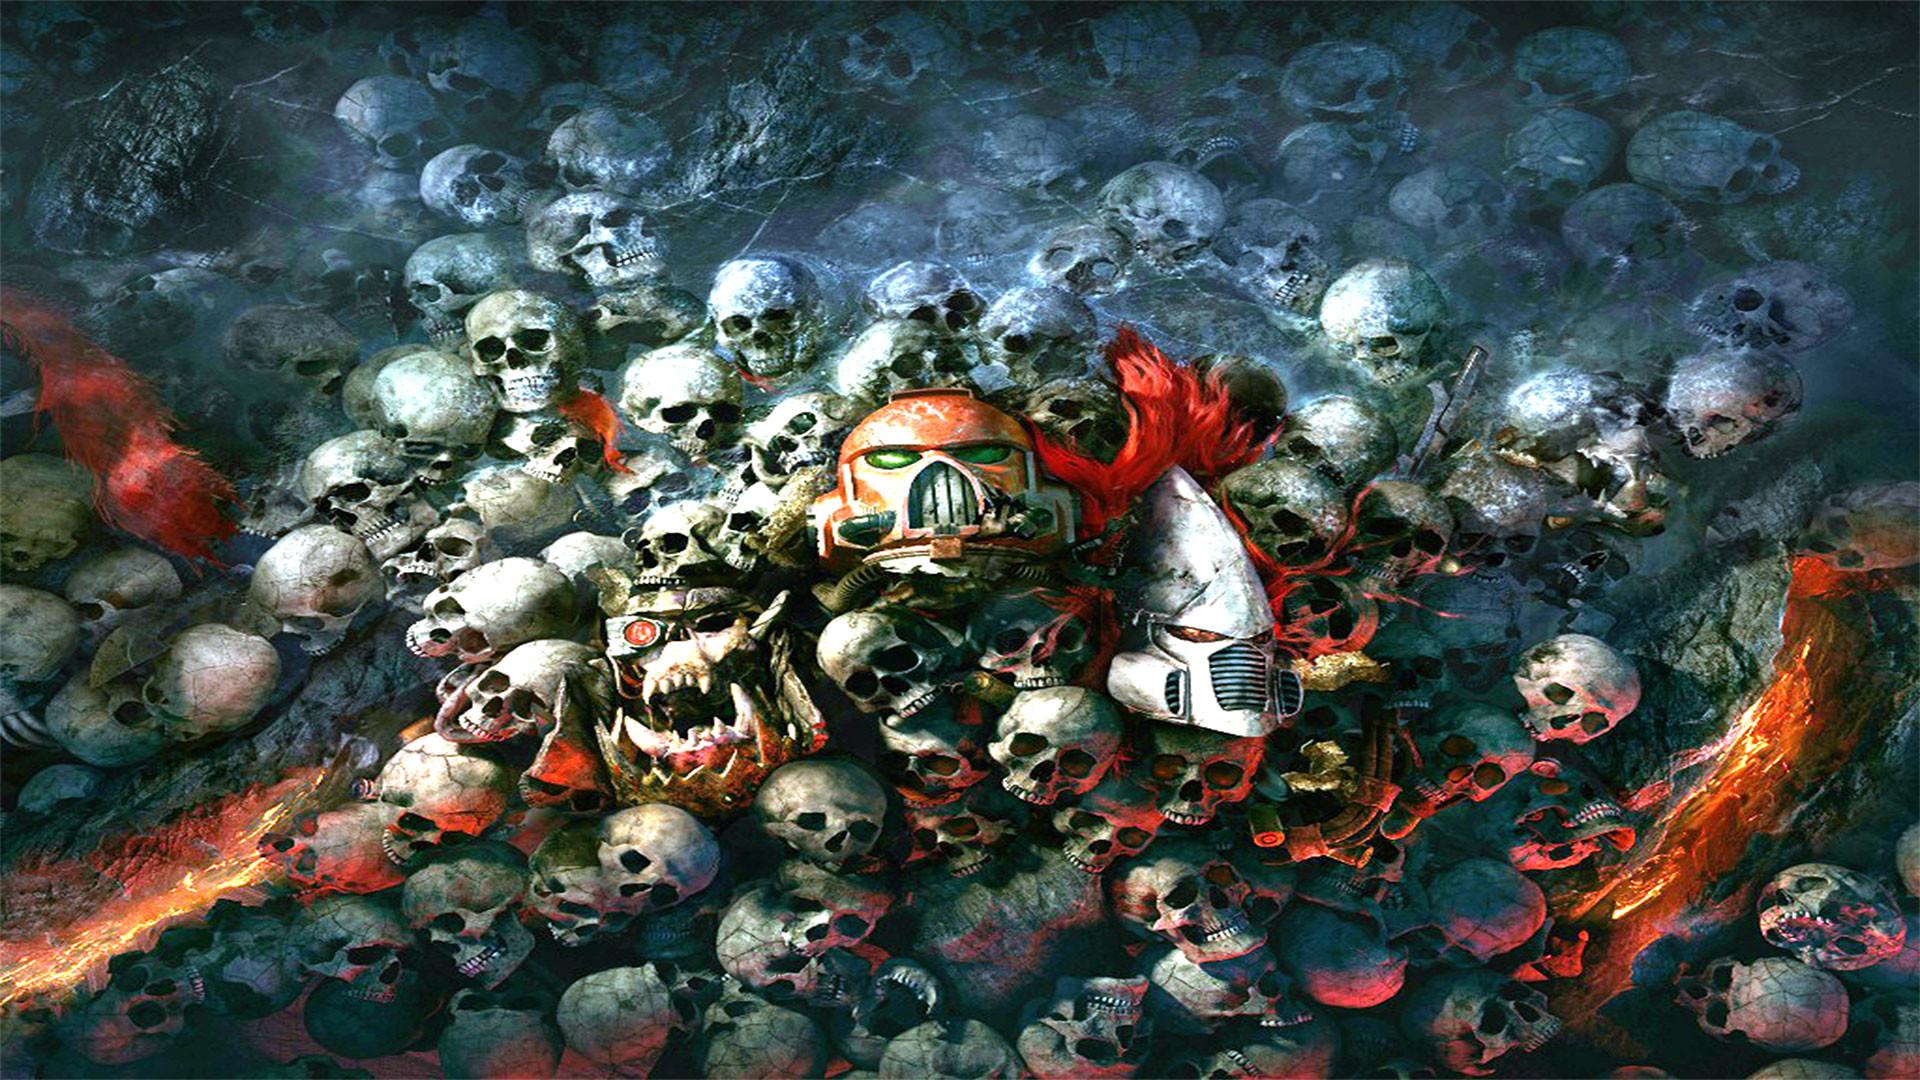 Warhammer 40,000: Dawn of War III 4K Wallpaper …